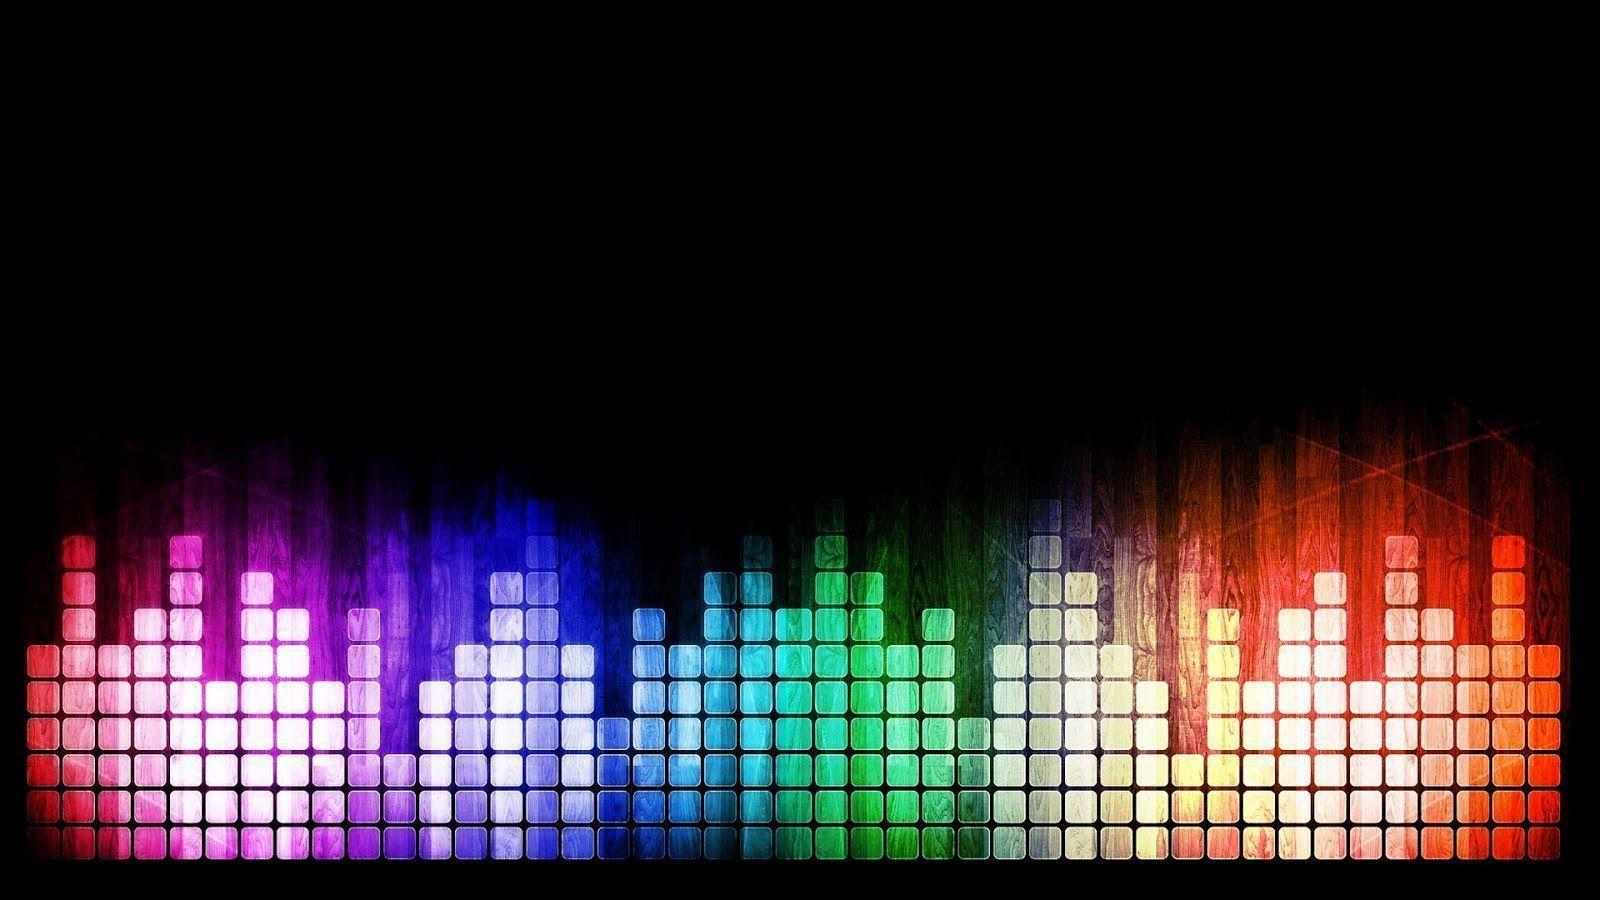 HD EDM Backgrounds - Wallpaper Cave